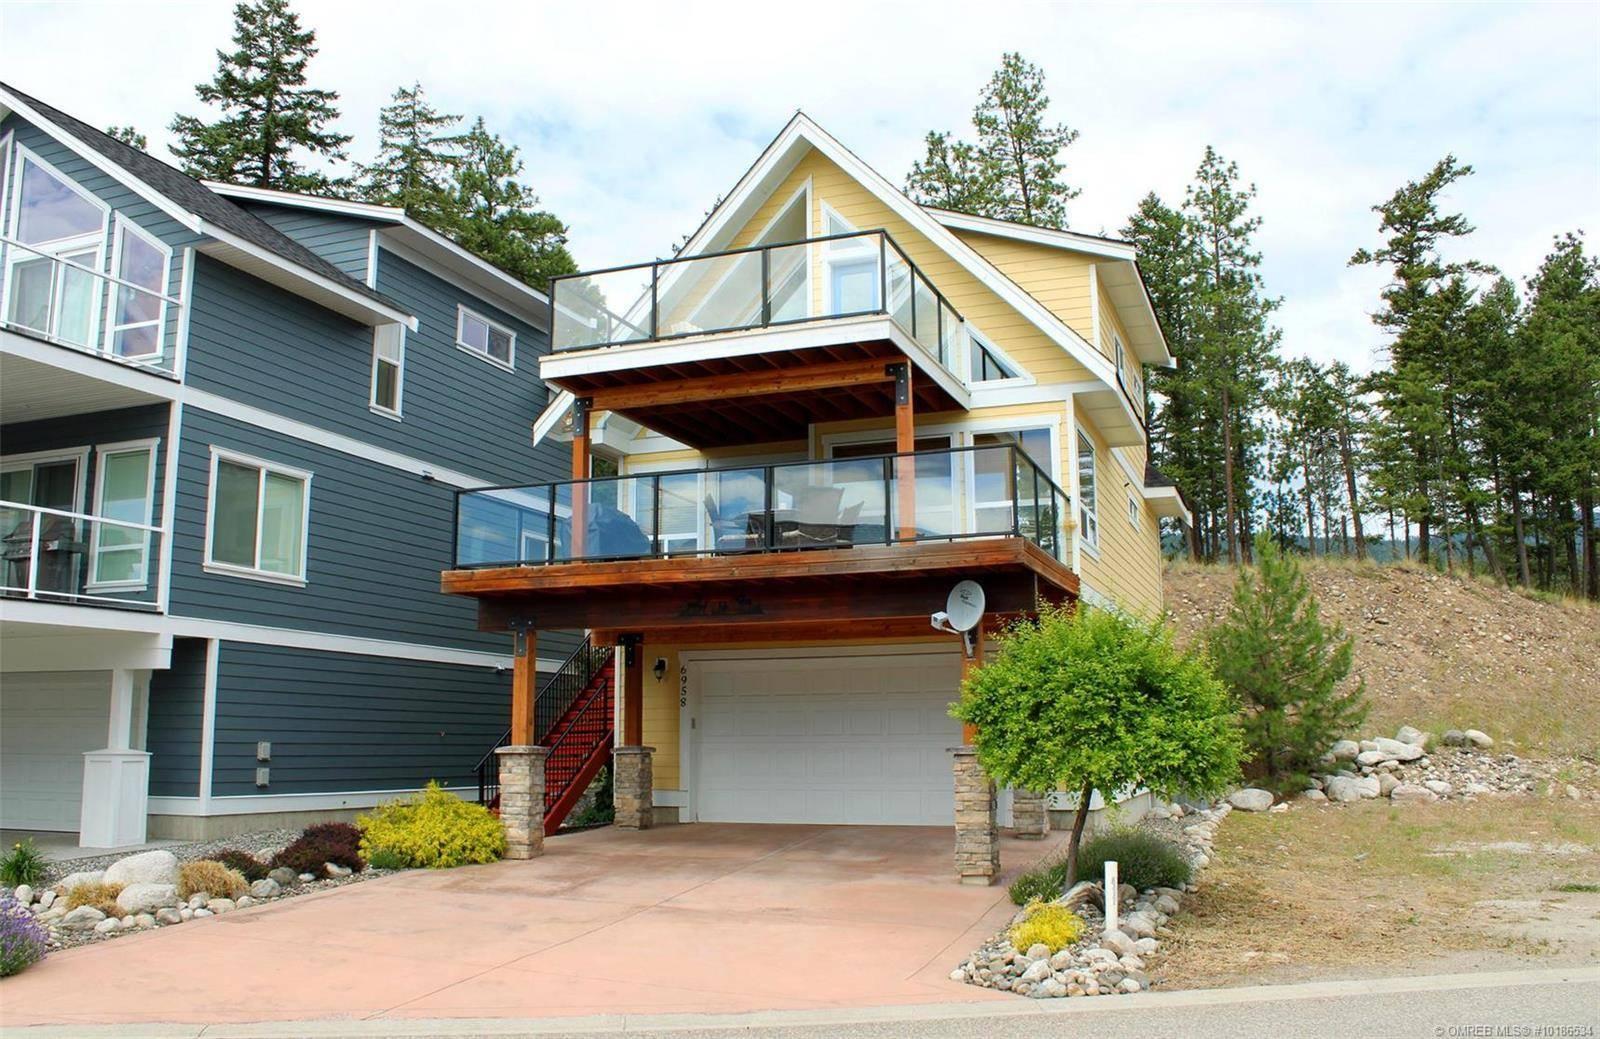 House for sale at 6958 Terazona Dr Unit 411 Kelowna British Columbia - MLS: 10186534